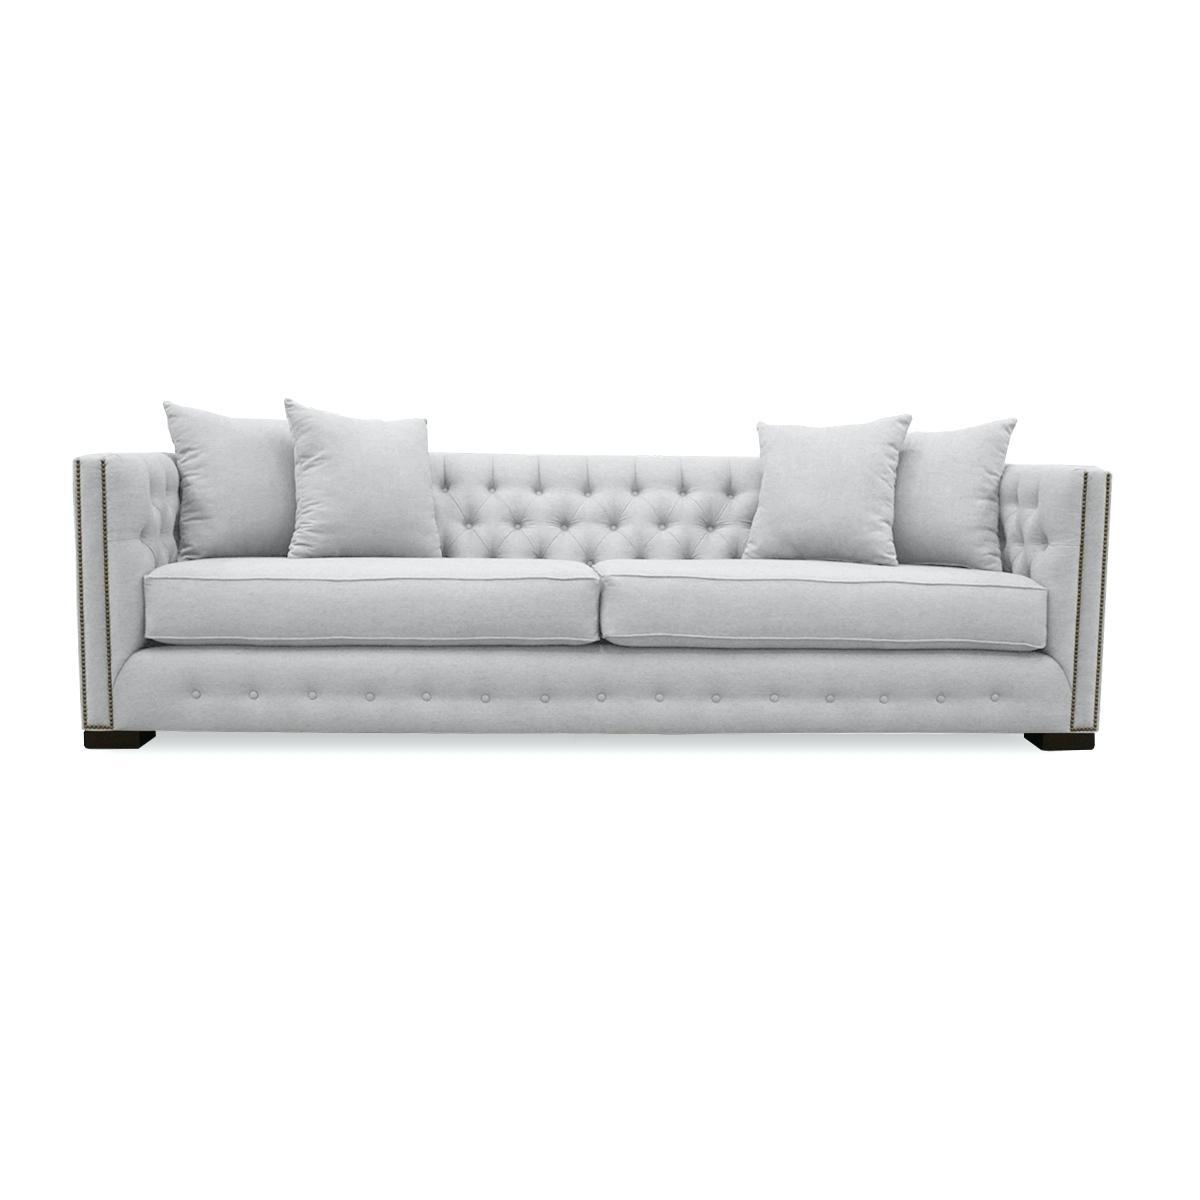 Sofa : Grey Tufted Sofa Charcoal Gray Nailhead Light Salt Lake City inside Salt Lake City Sectional Sofas (Image 9 of 10)